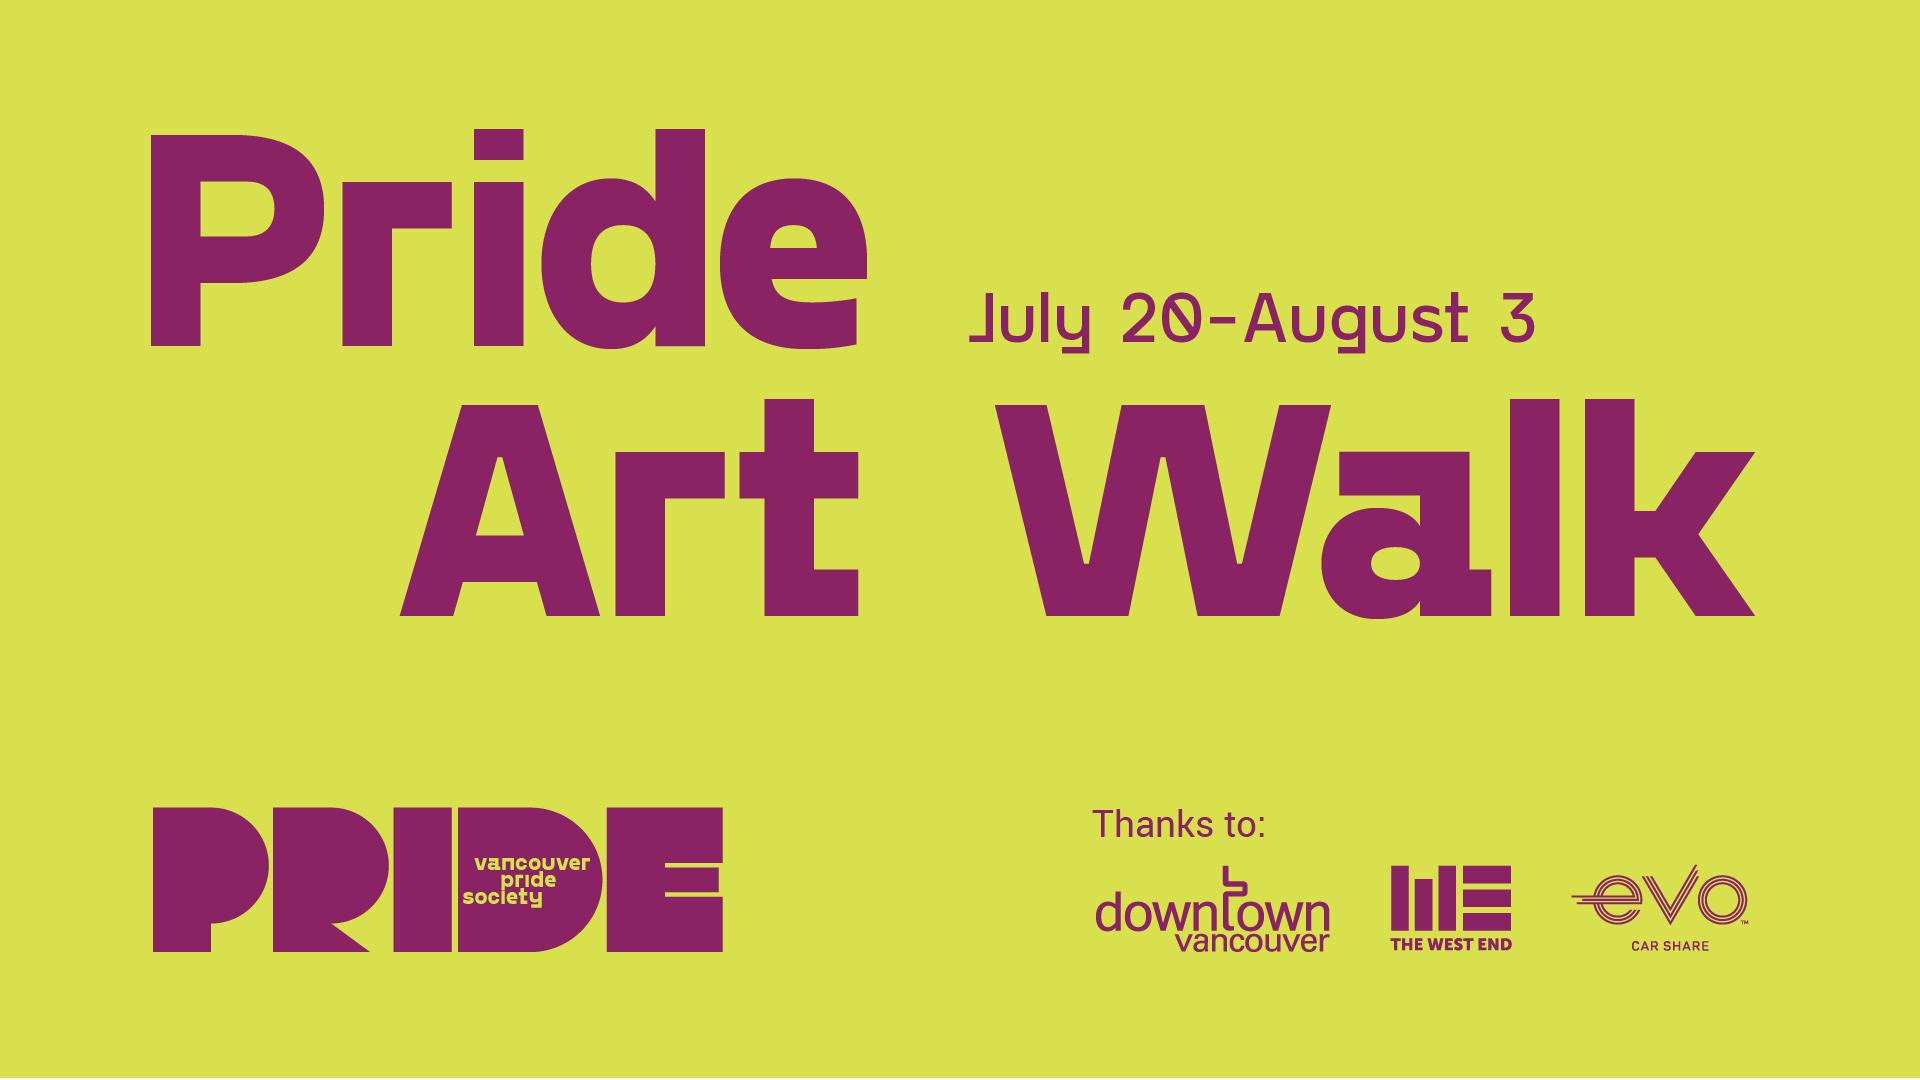 Banner advertising Pride Art Walk, July 20 to August 3rd.